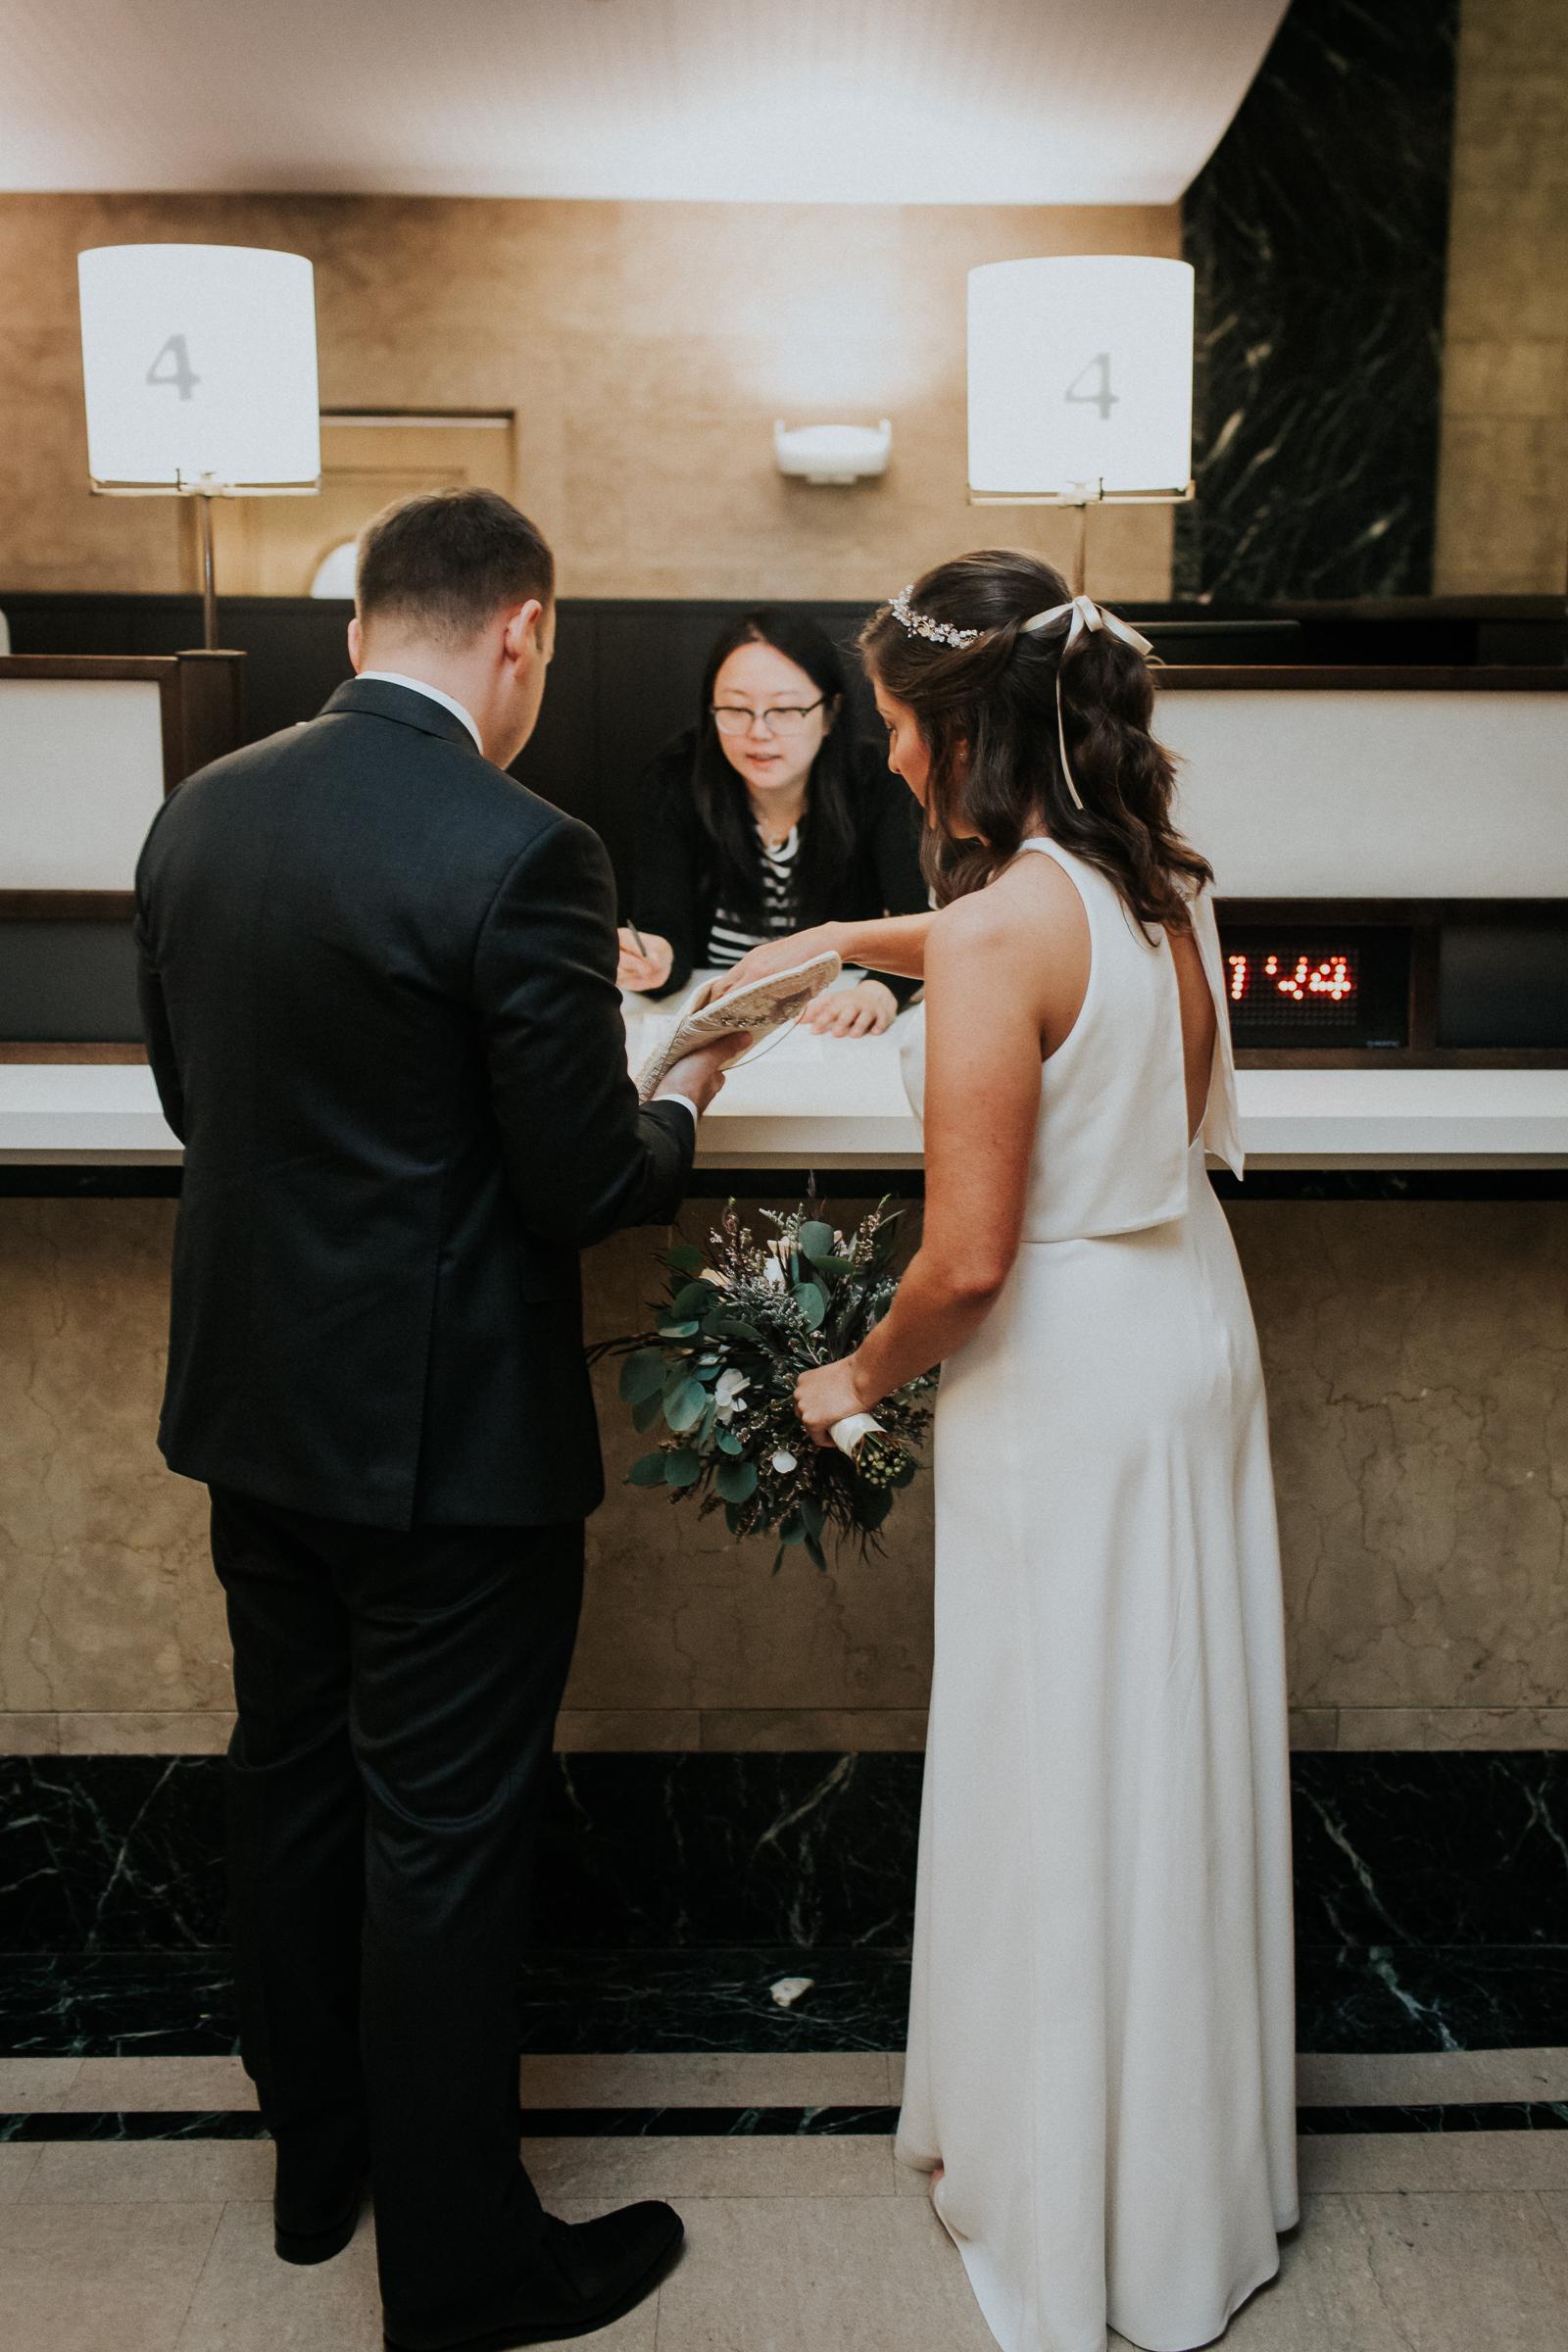 Casa-Apicii-Intimate-Wedding-City-Hall-Elopement-New-York-Documentary-Wedding-Photographer-2.jpg